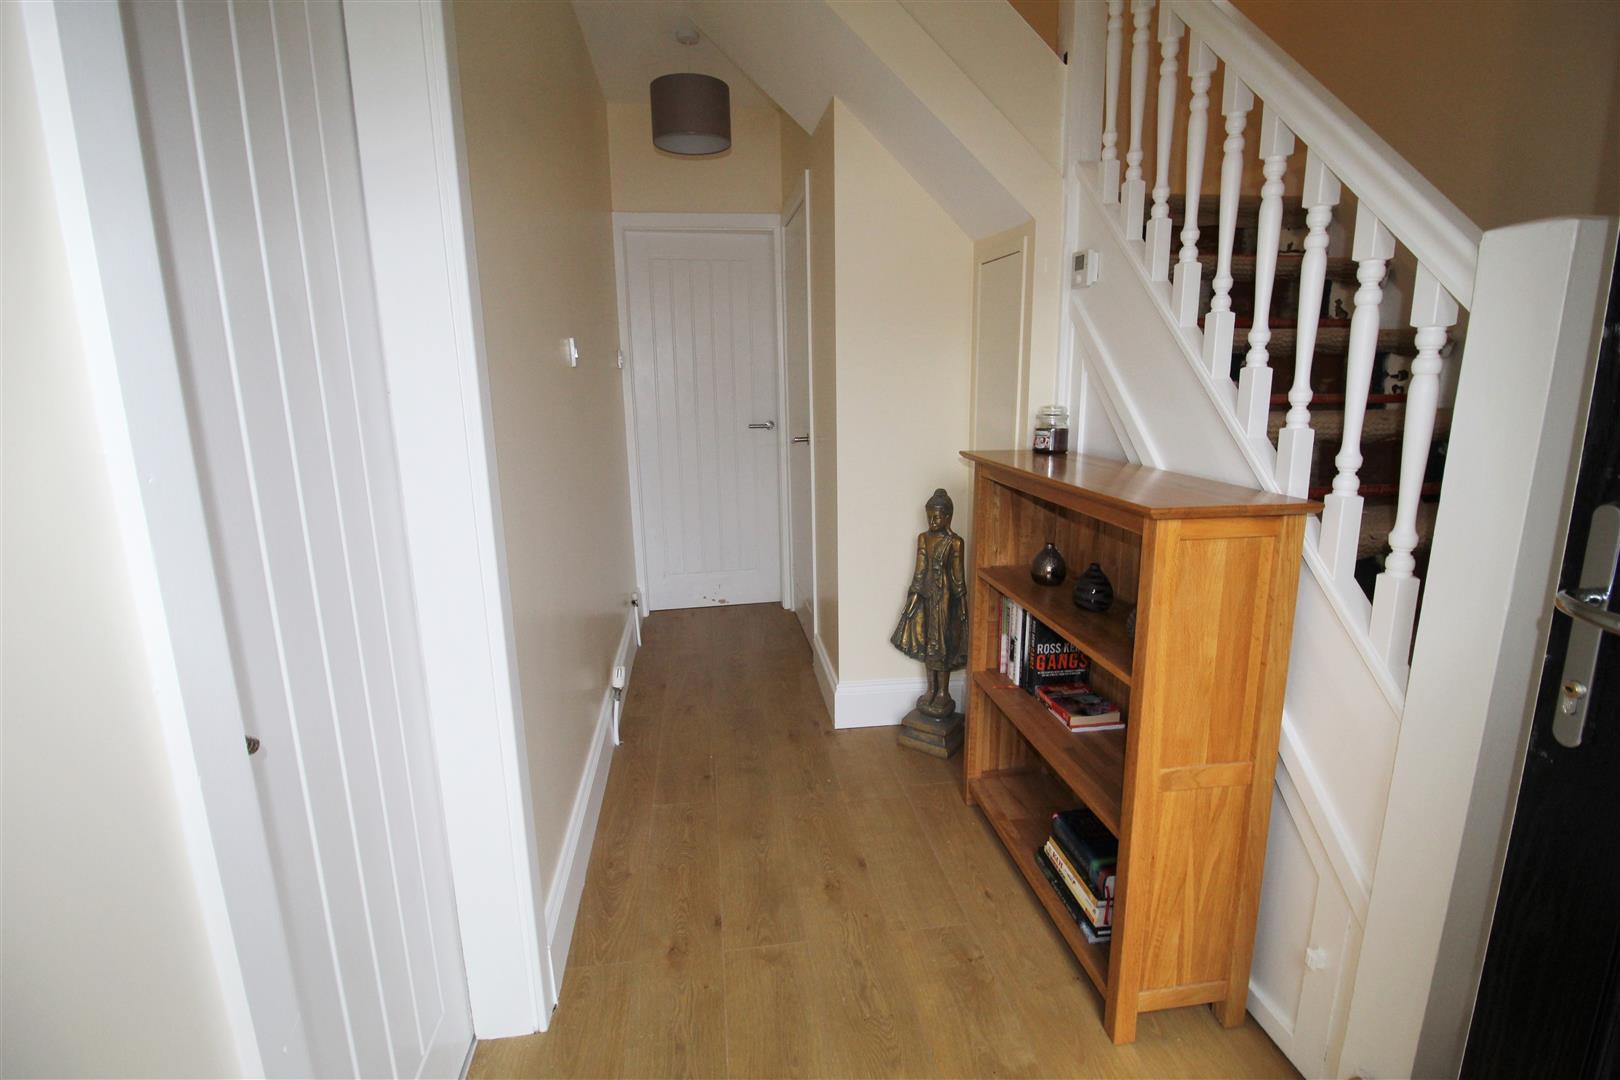 3 Bedrooms, House - Semi-Detached, Oriel Drive, Liverpool